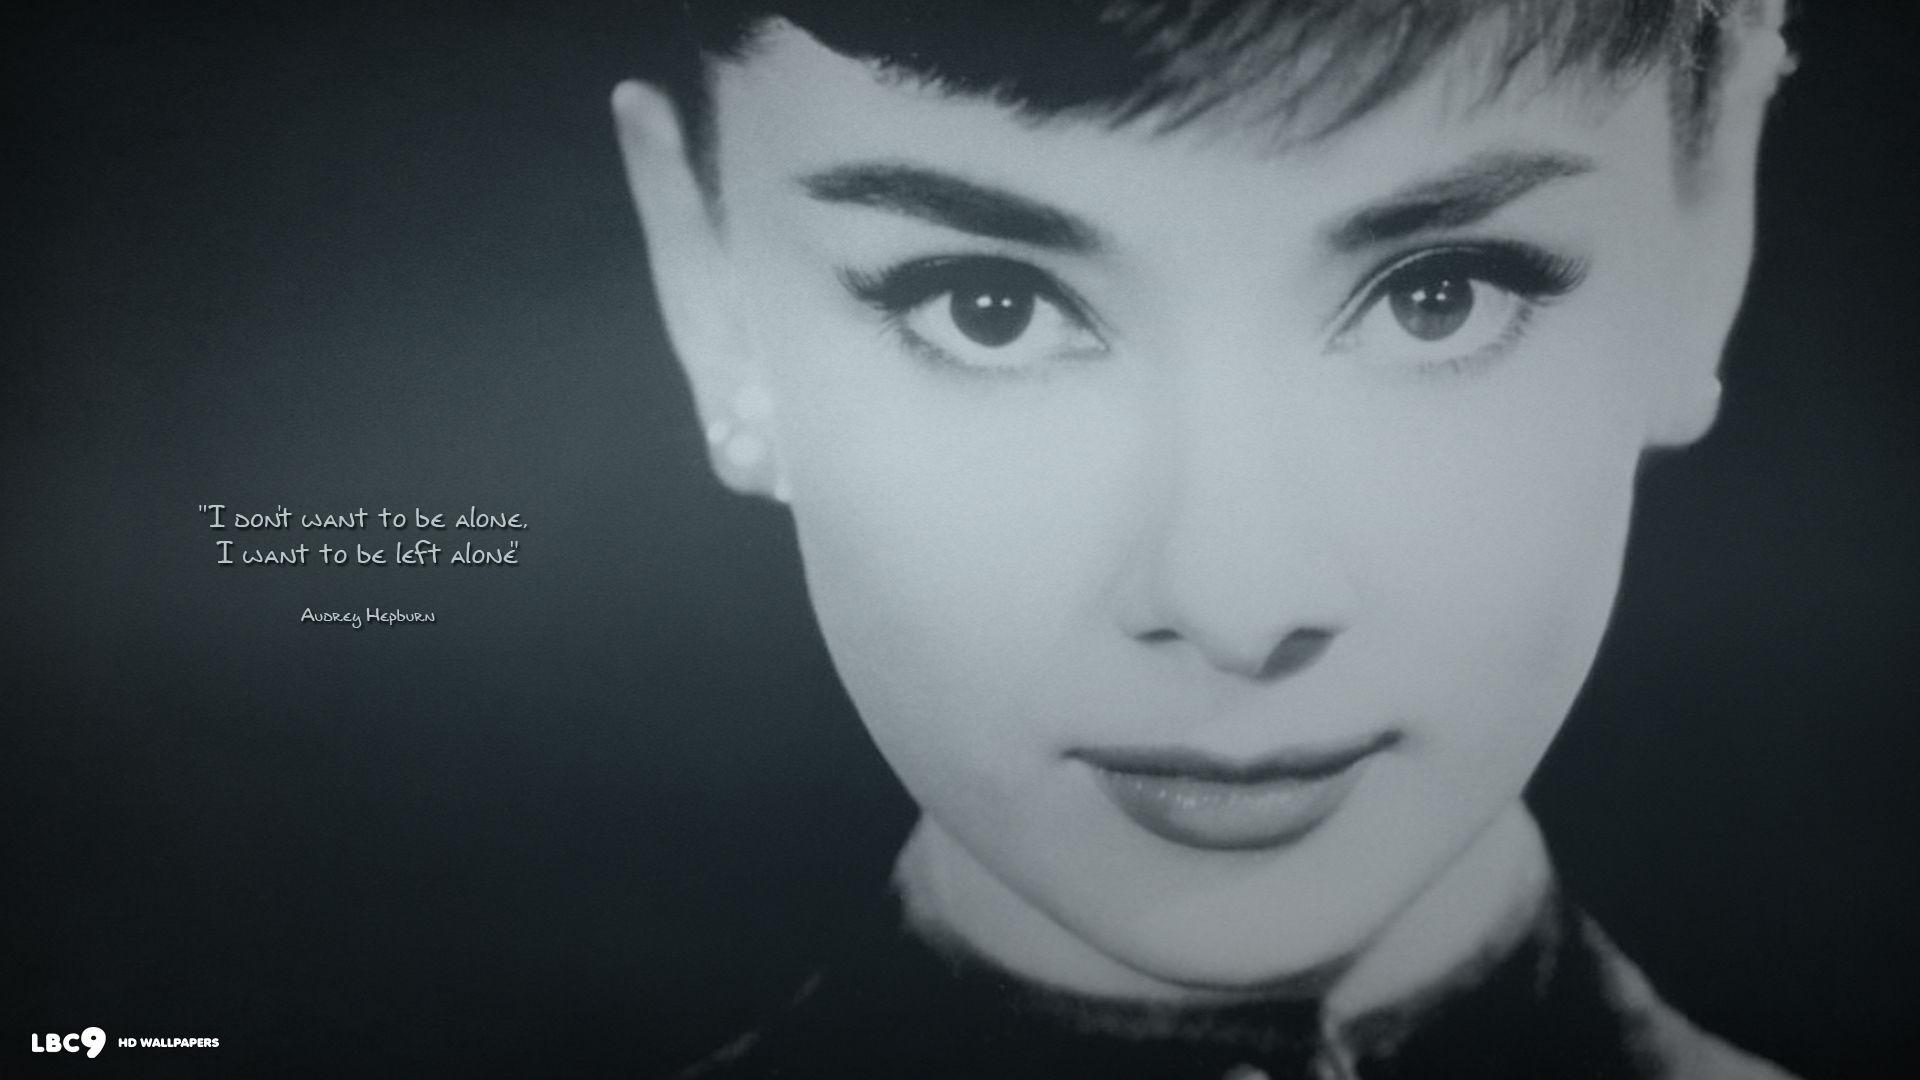 Audrey Hepburn Wallpaper 2350 Actresses Hd Backgrounds 1920x1080